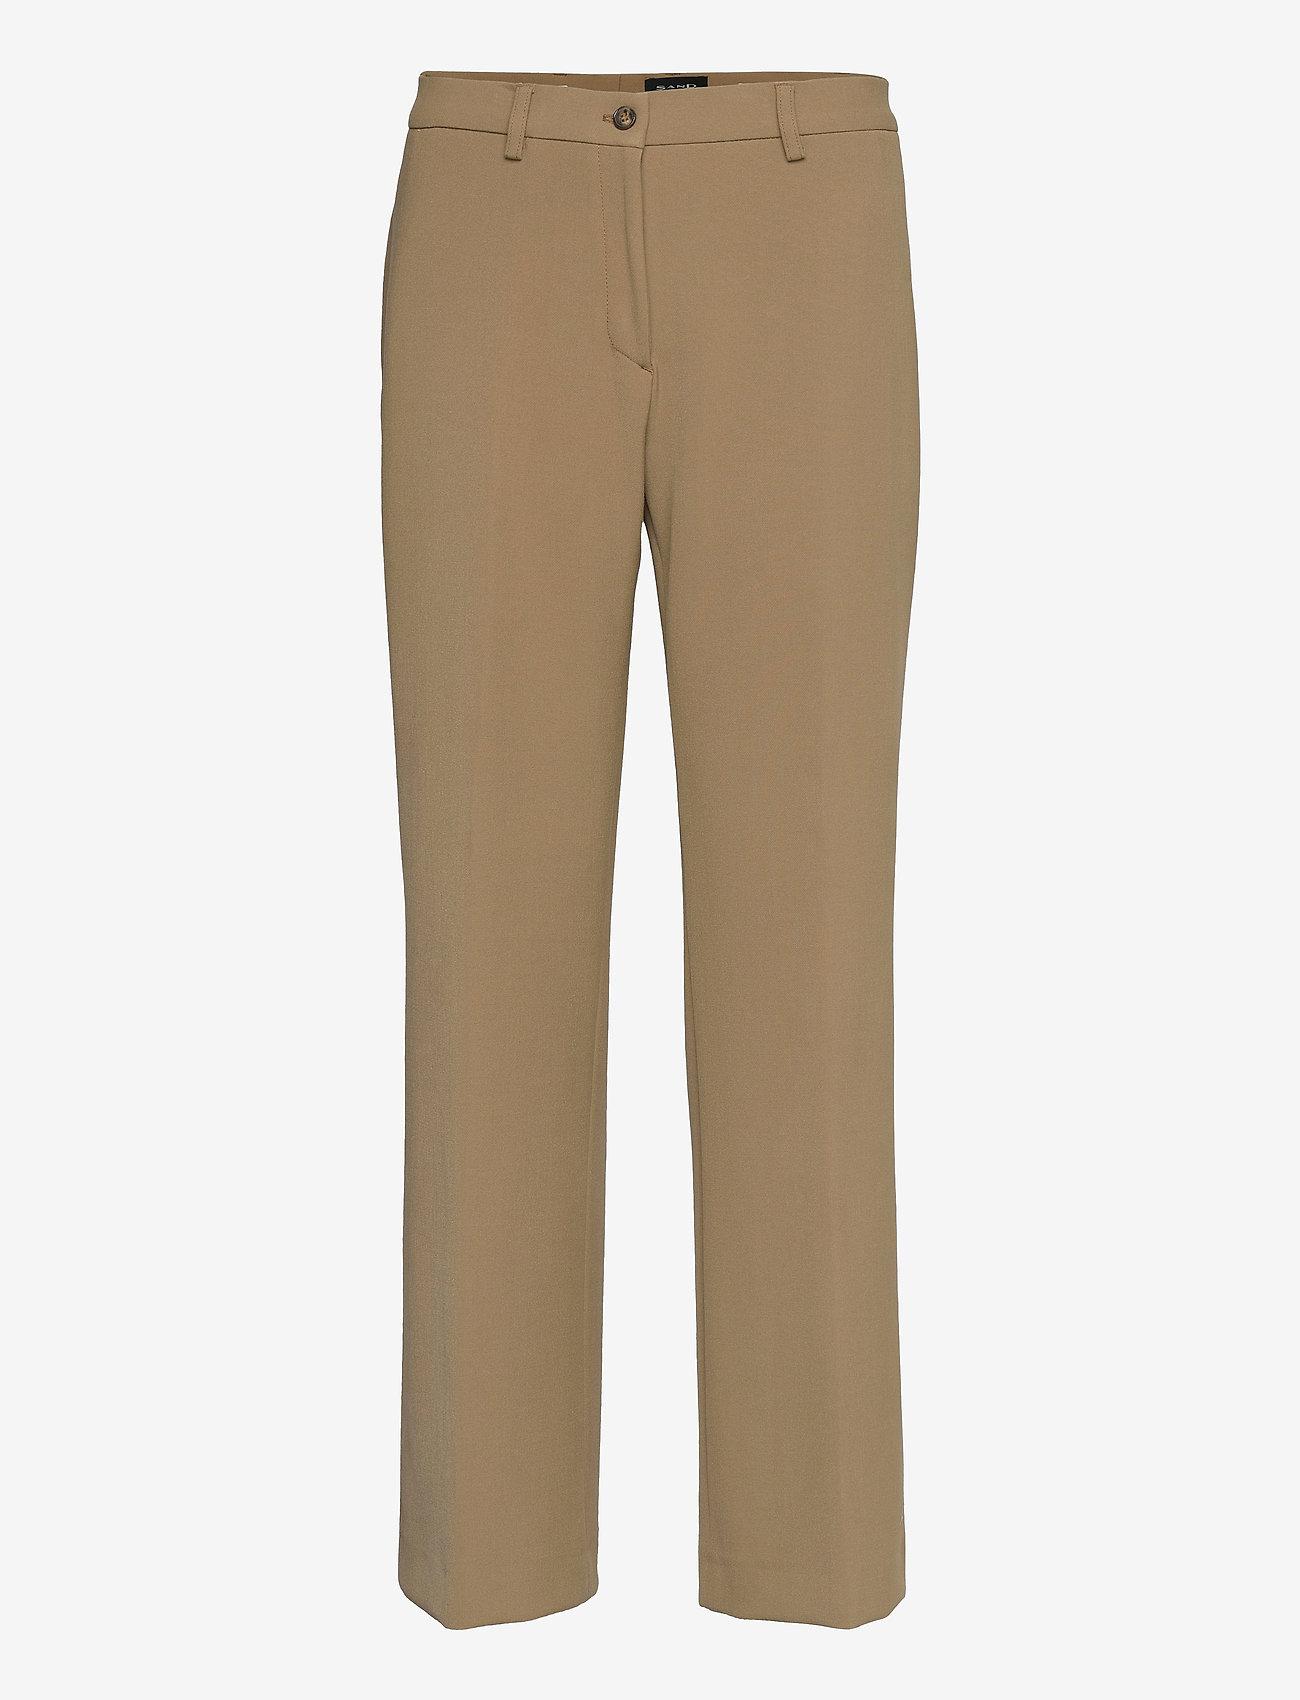 SAND - 3596 - Sasha Tailored - broeken med straight ben - light camel - 0